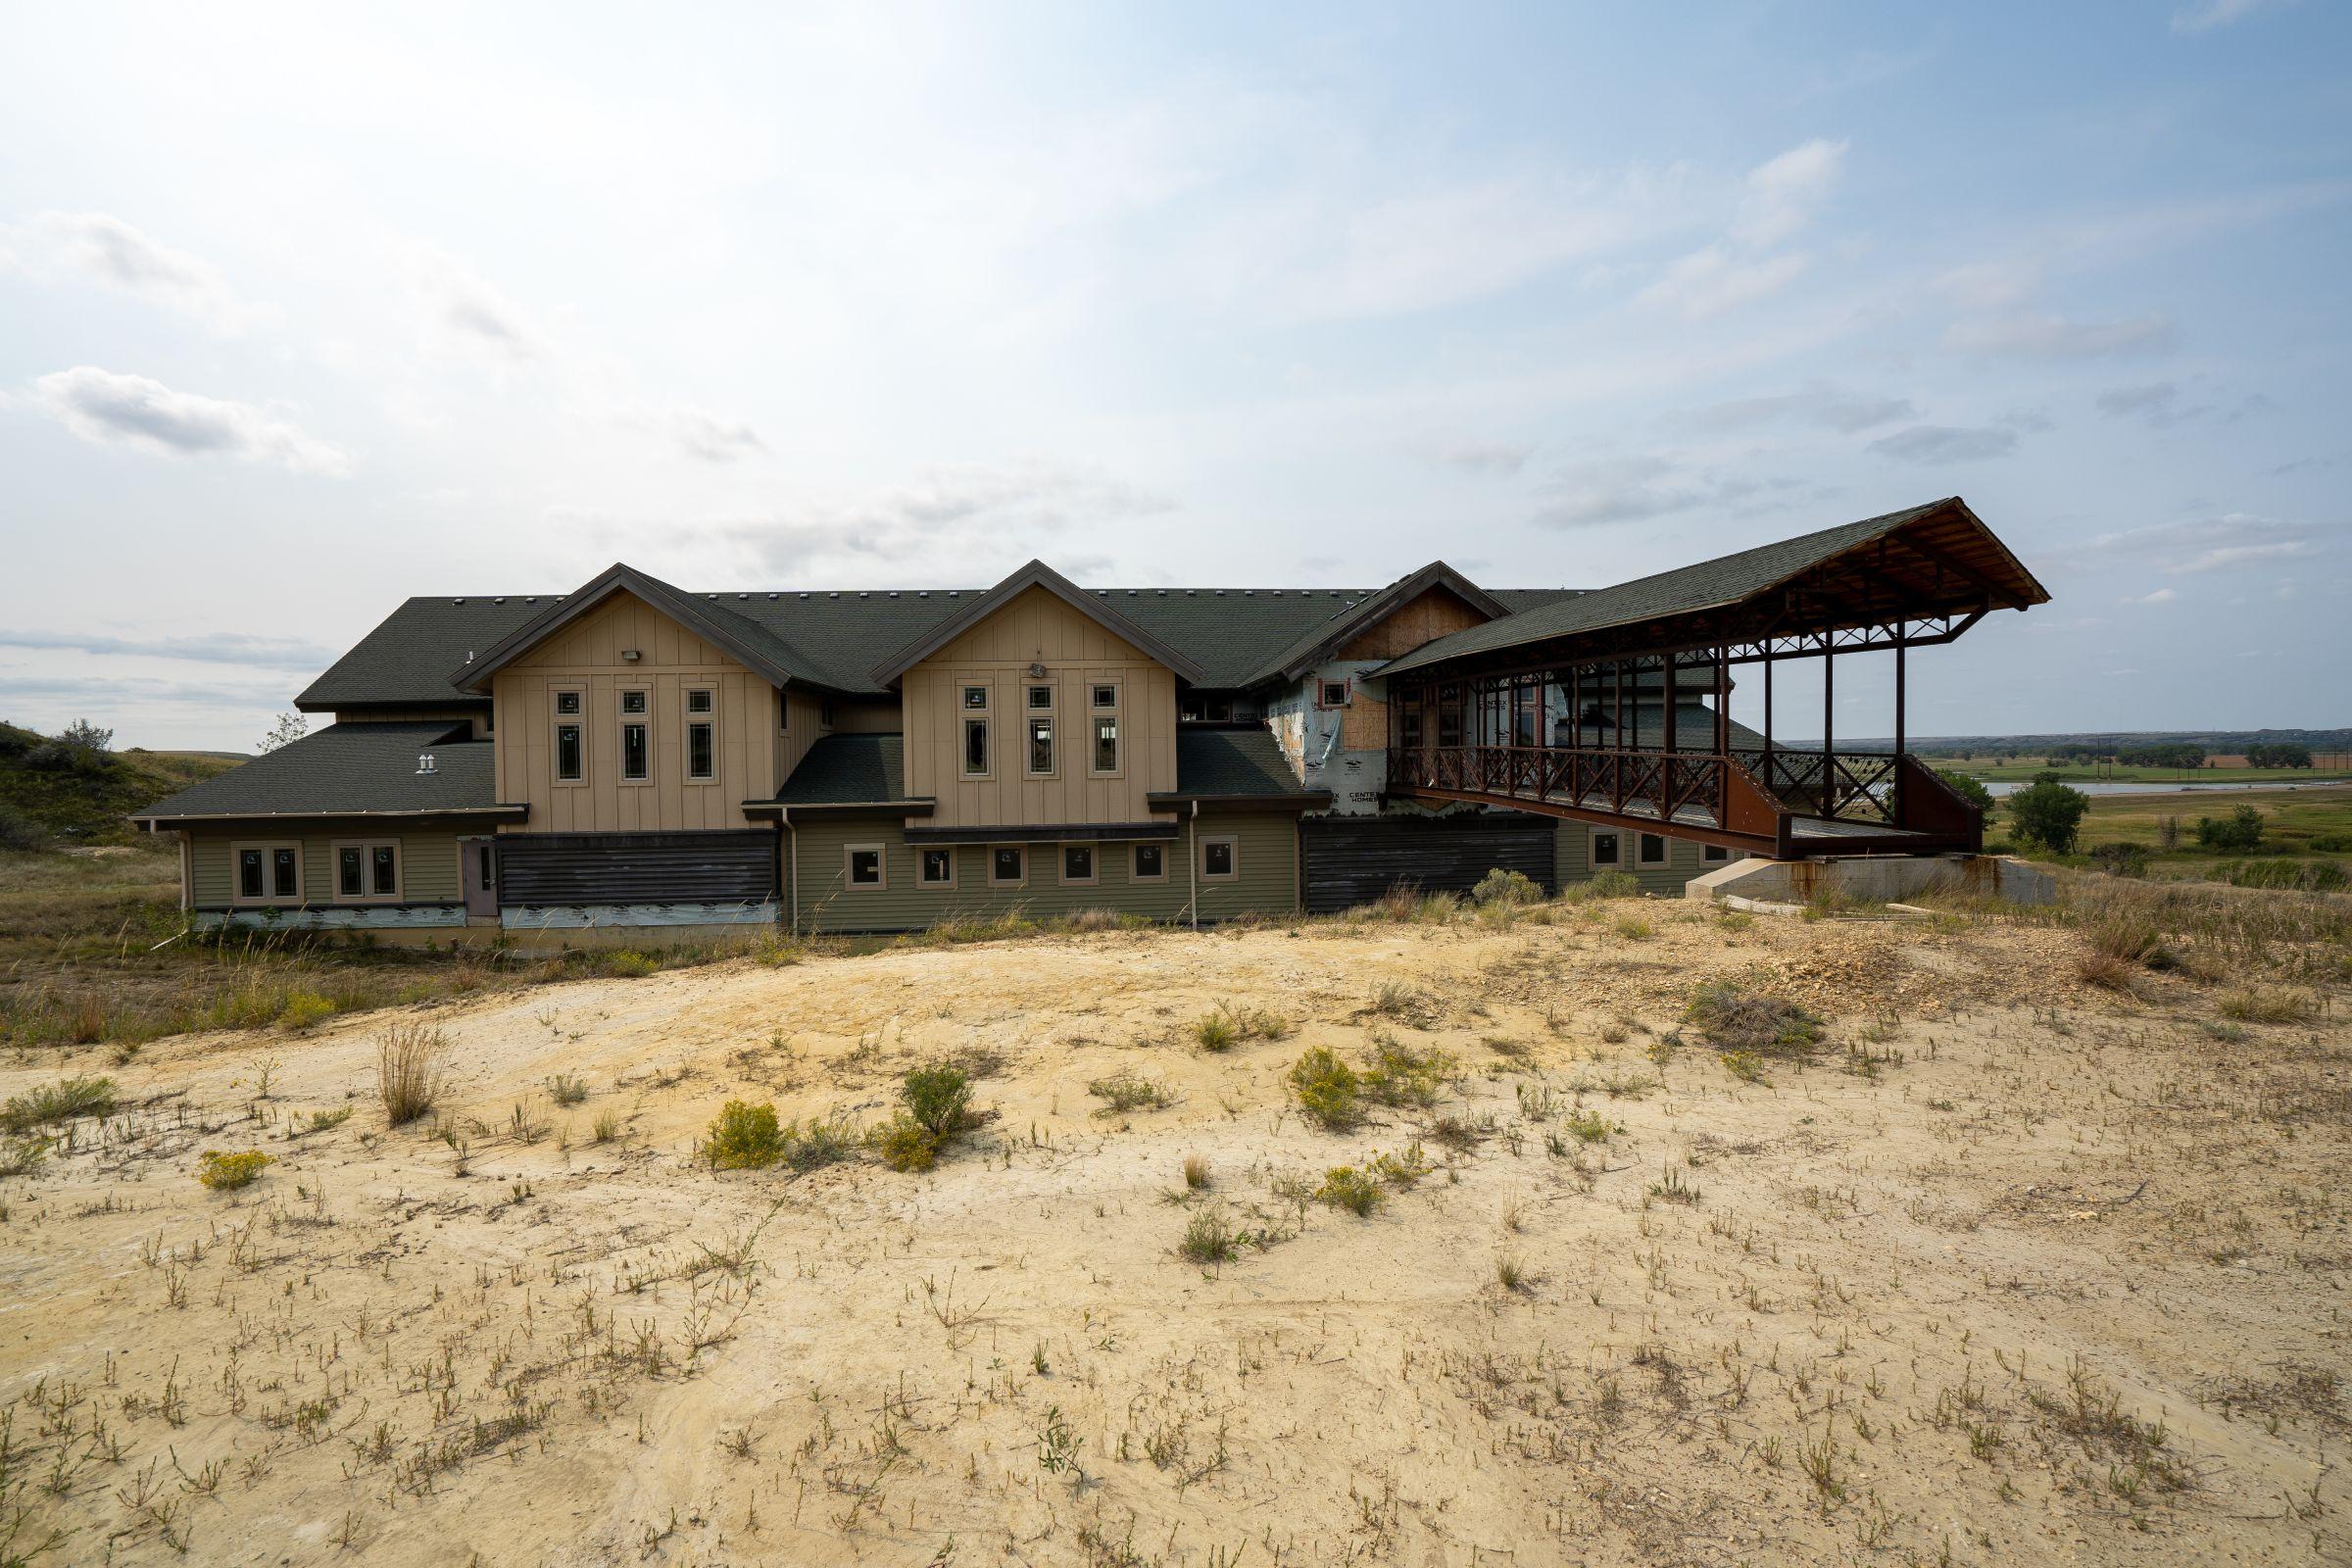 auctions-land-mckenzie-county-north-dakota-270-acres-listing-number-15735-3-2021-09-10-043904.jpeg